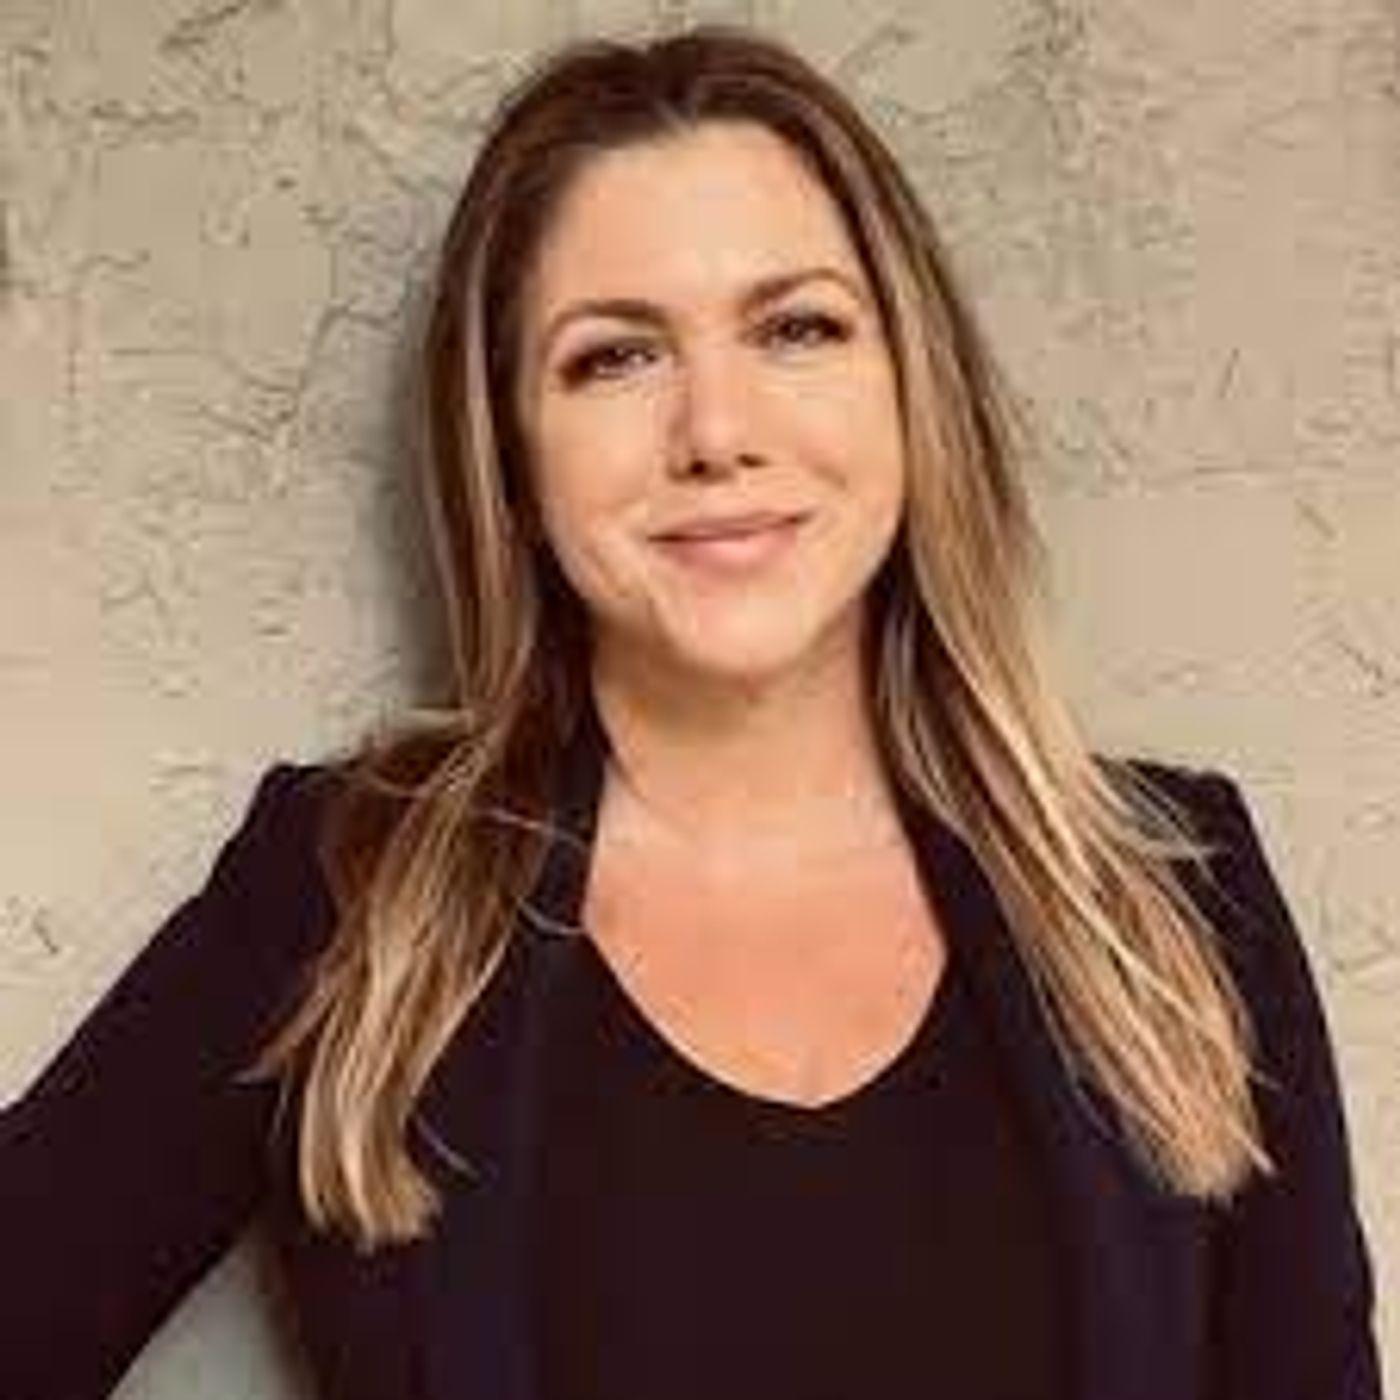 The Emerging Regenerative Customer with Emily Olson